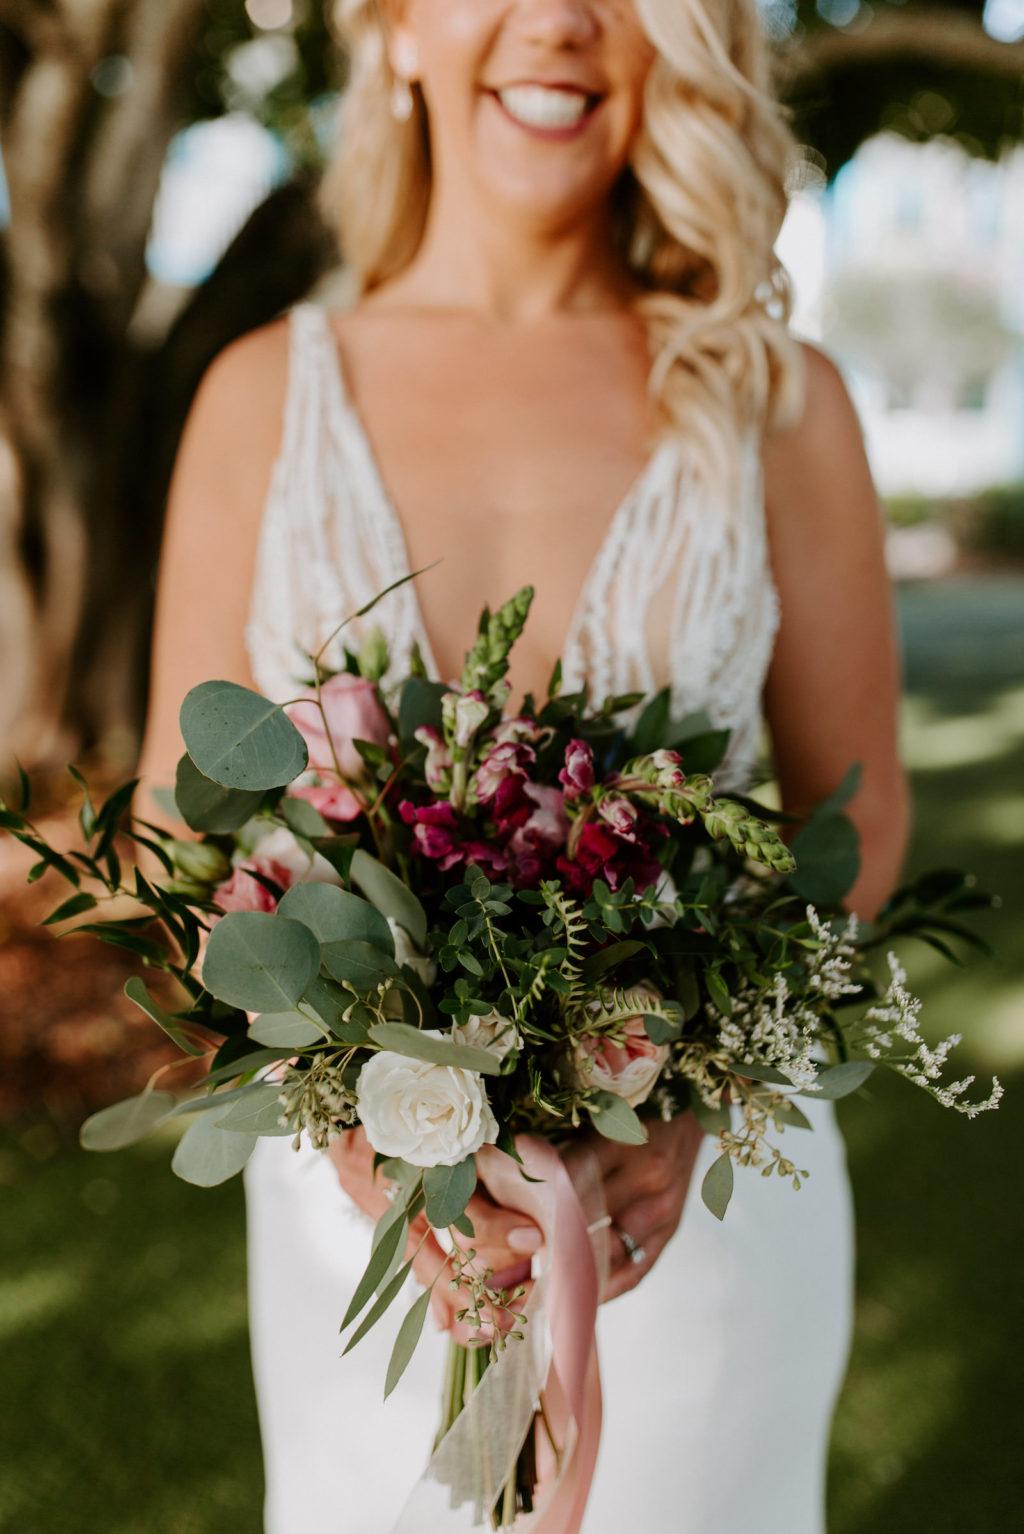 Tampa Bride Holding Wild Greenery Eucalyptus with Purple Flowers Wedding Bouquet